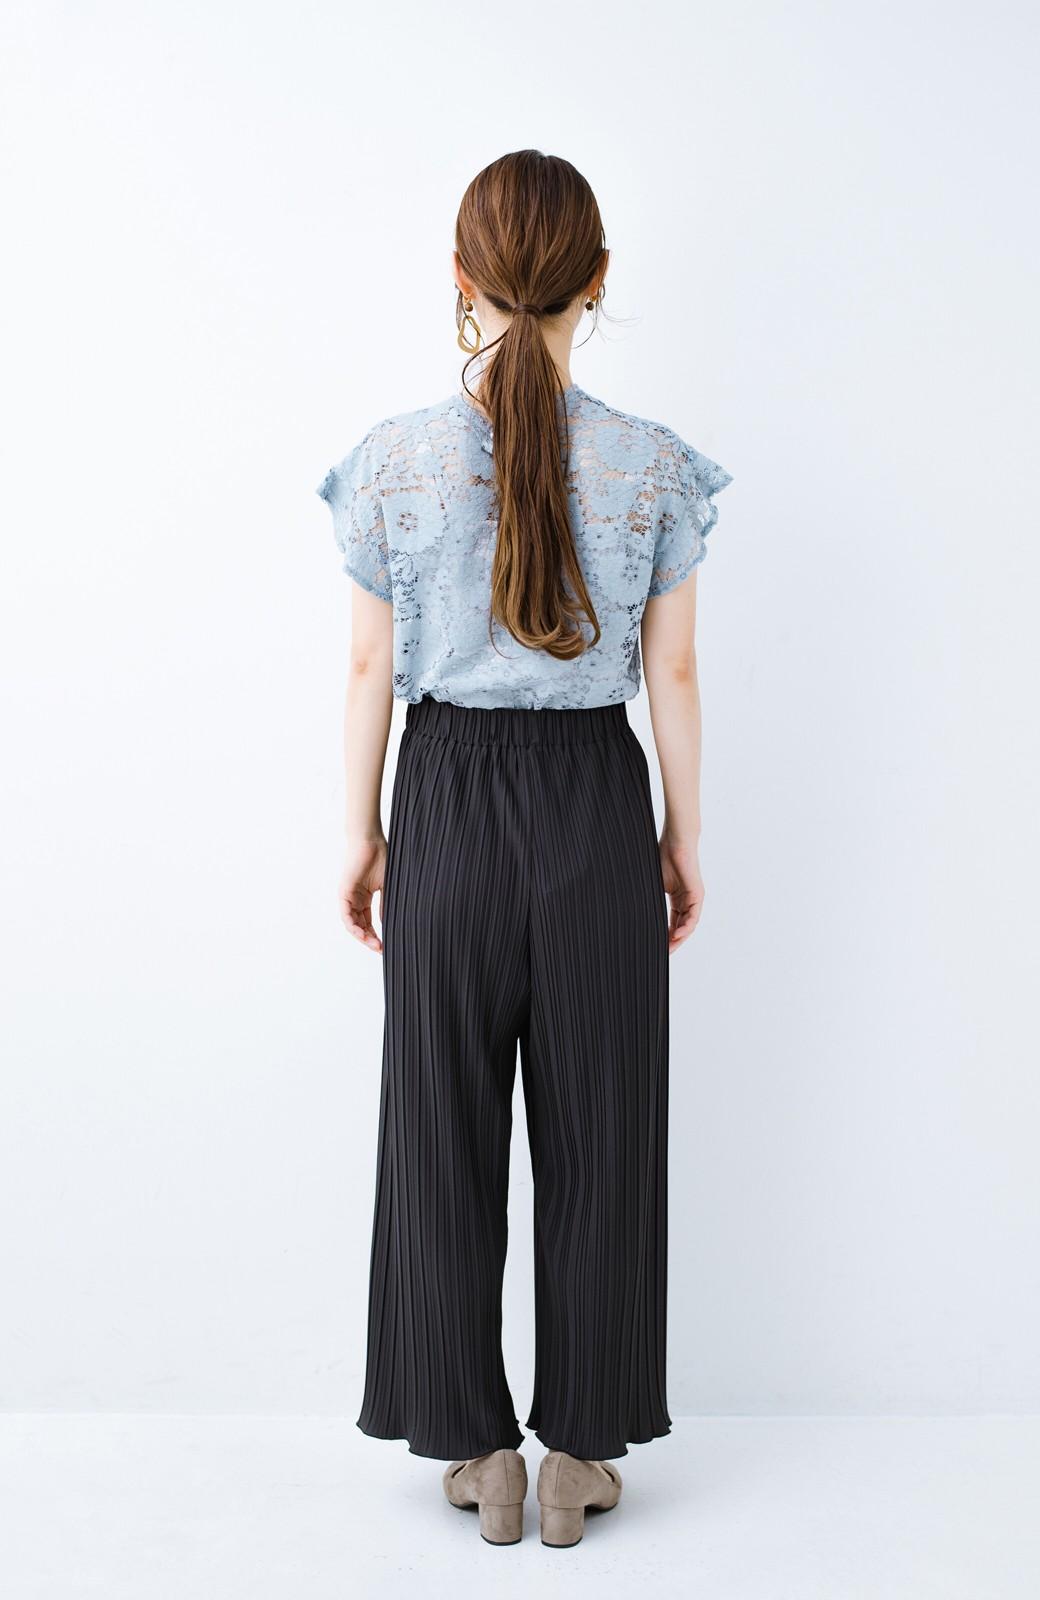 haco! パンツ派さんのデートにもカジュアル派さんの重ね着にも便利なプリーツパンツ  <チャコールグレー>の商品写真19